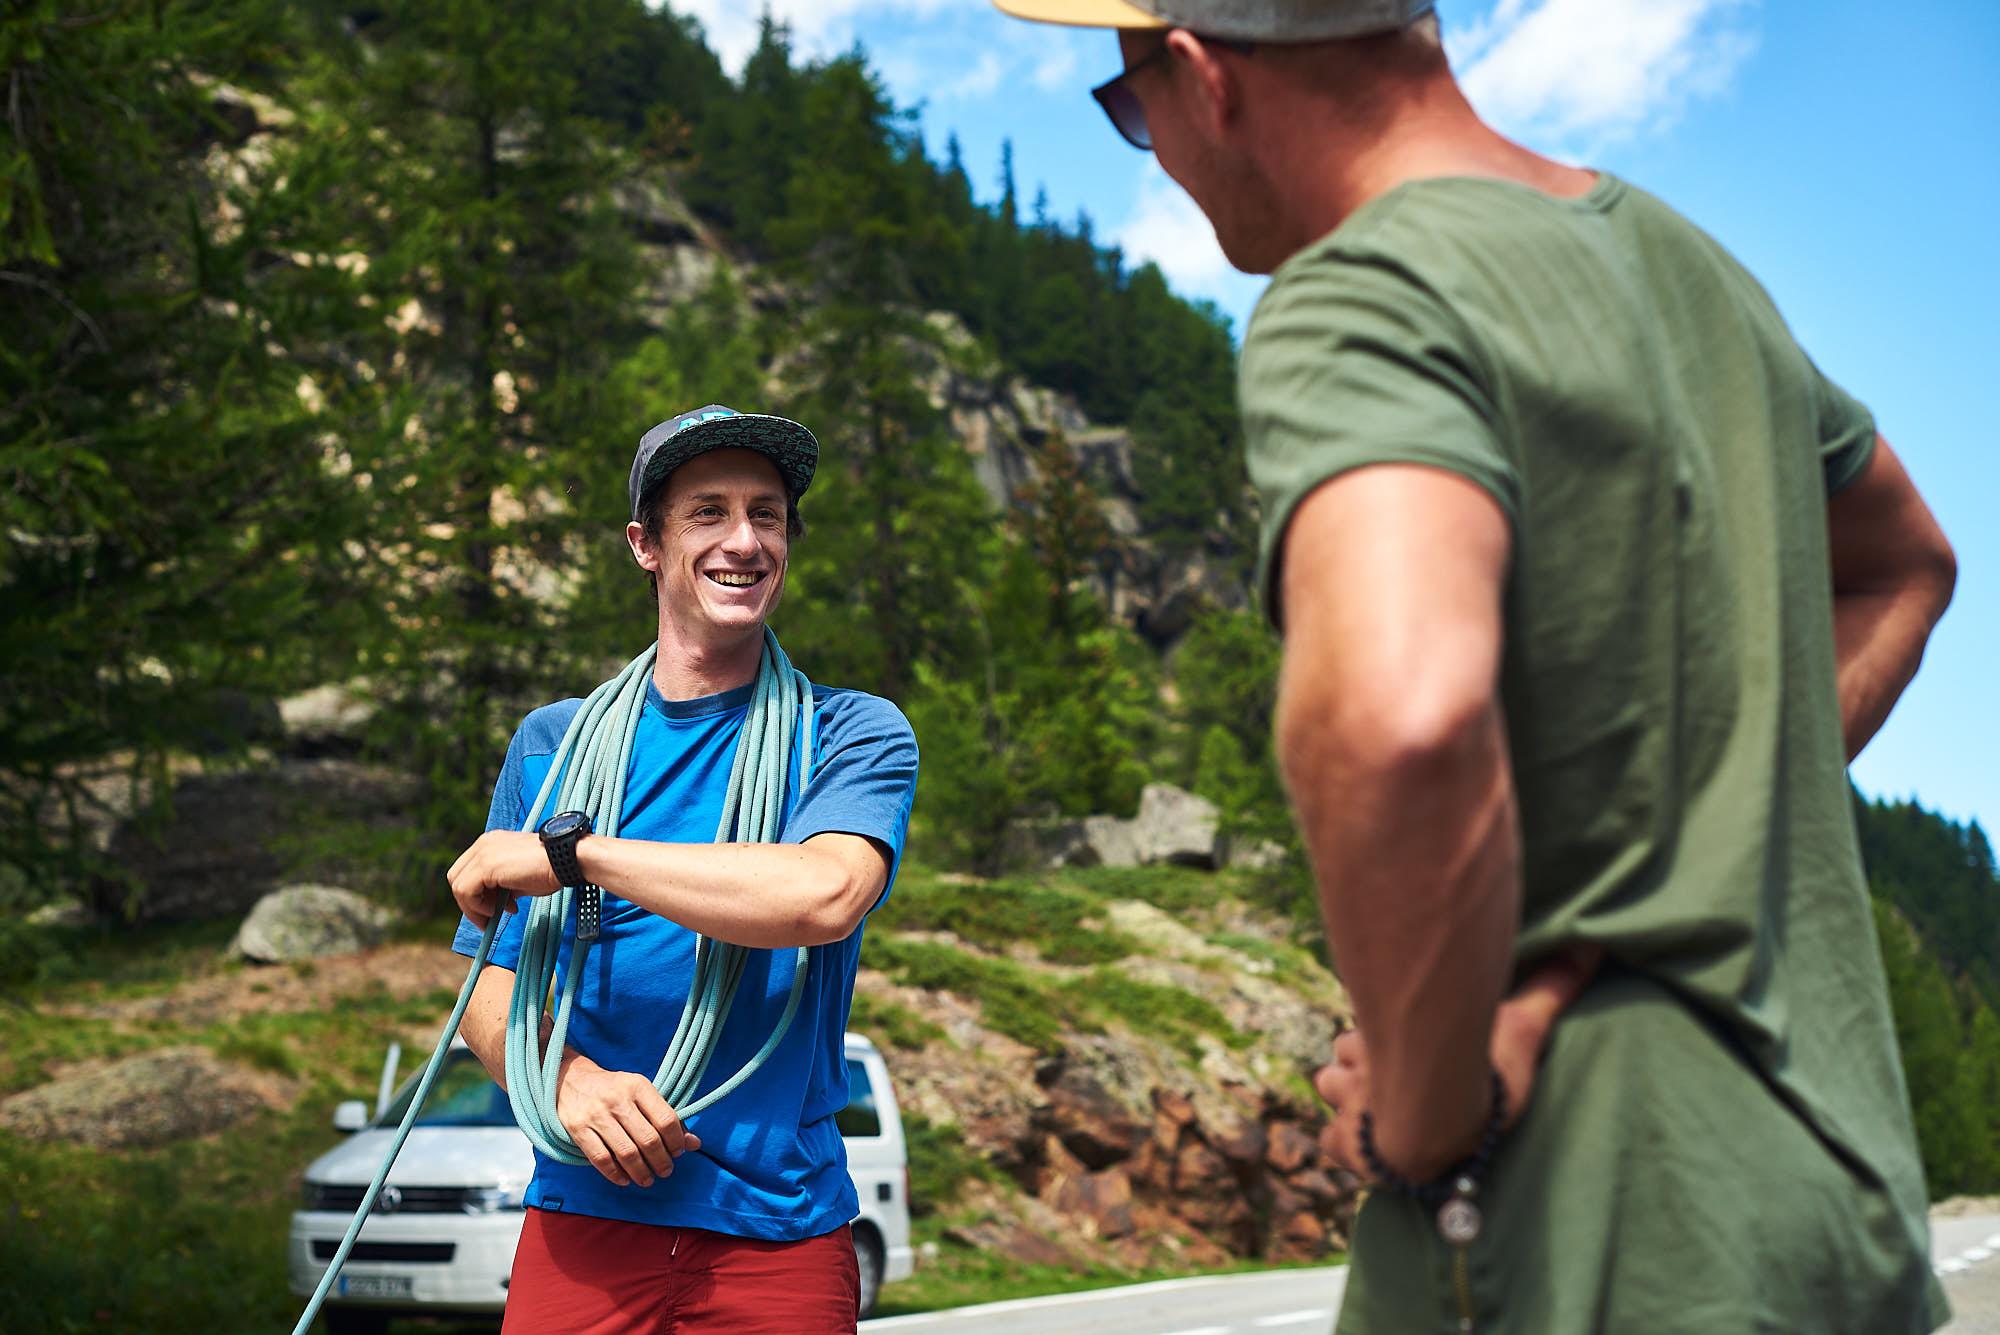 Mountain guide preparing his alpine gear in Italy